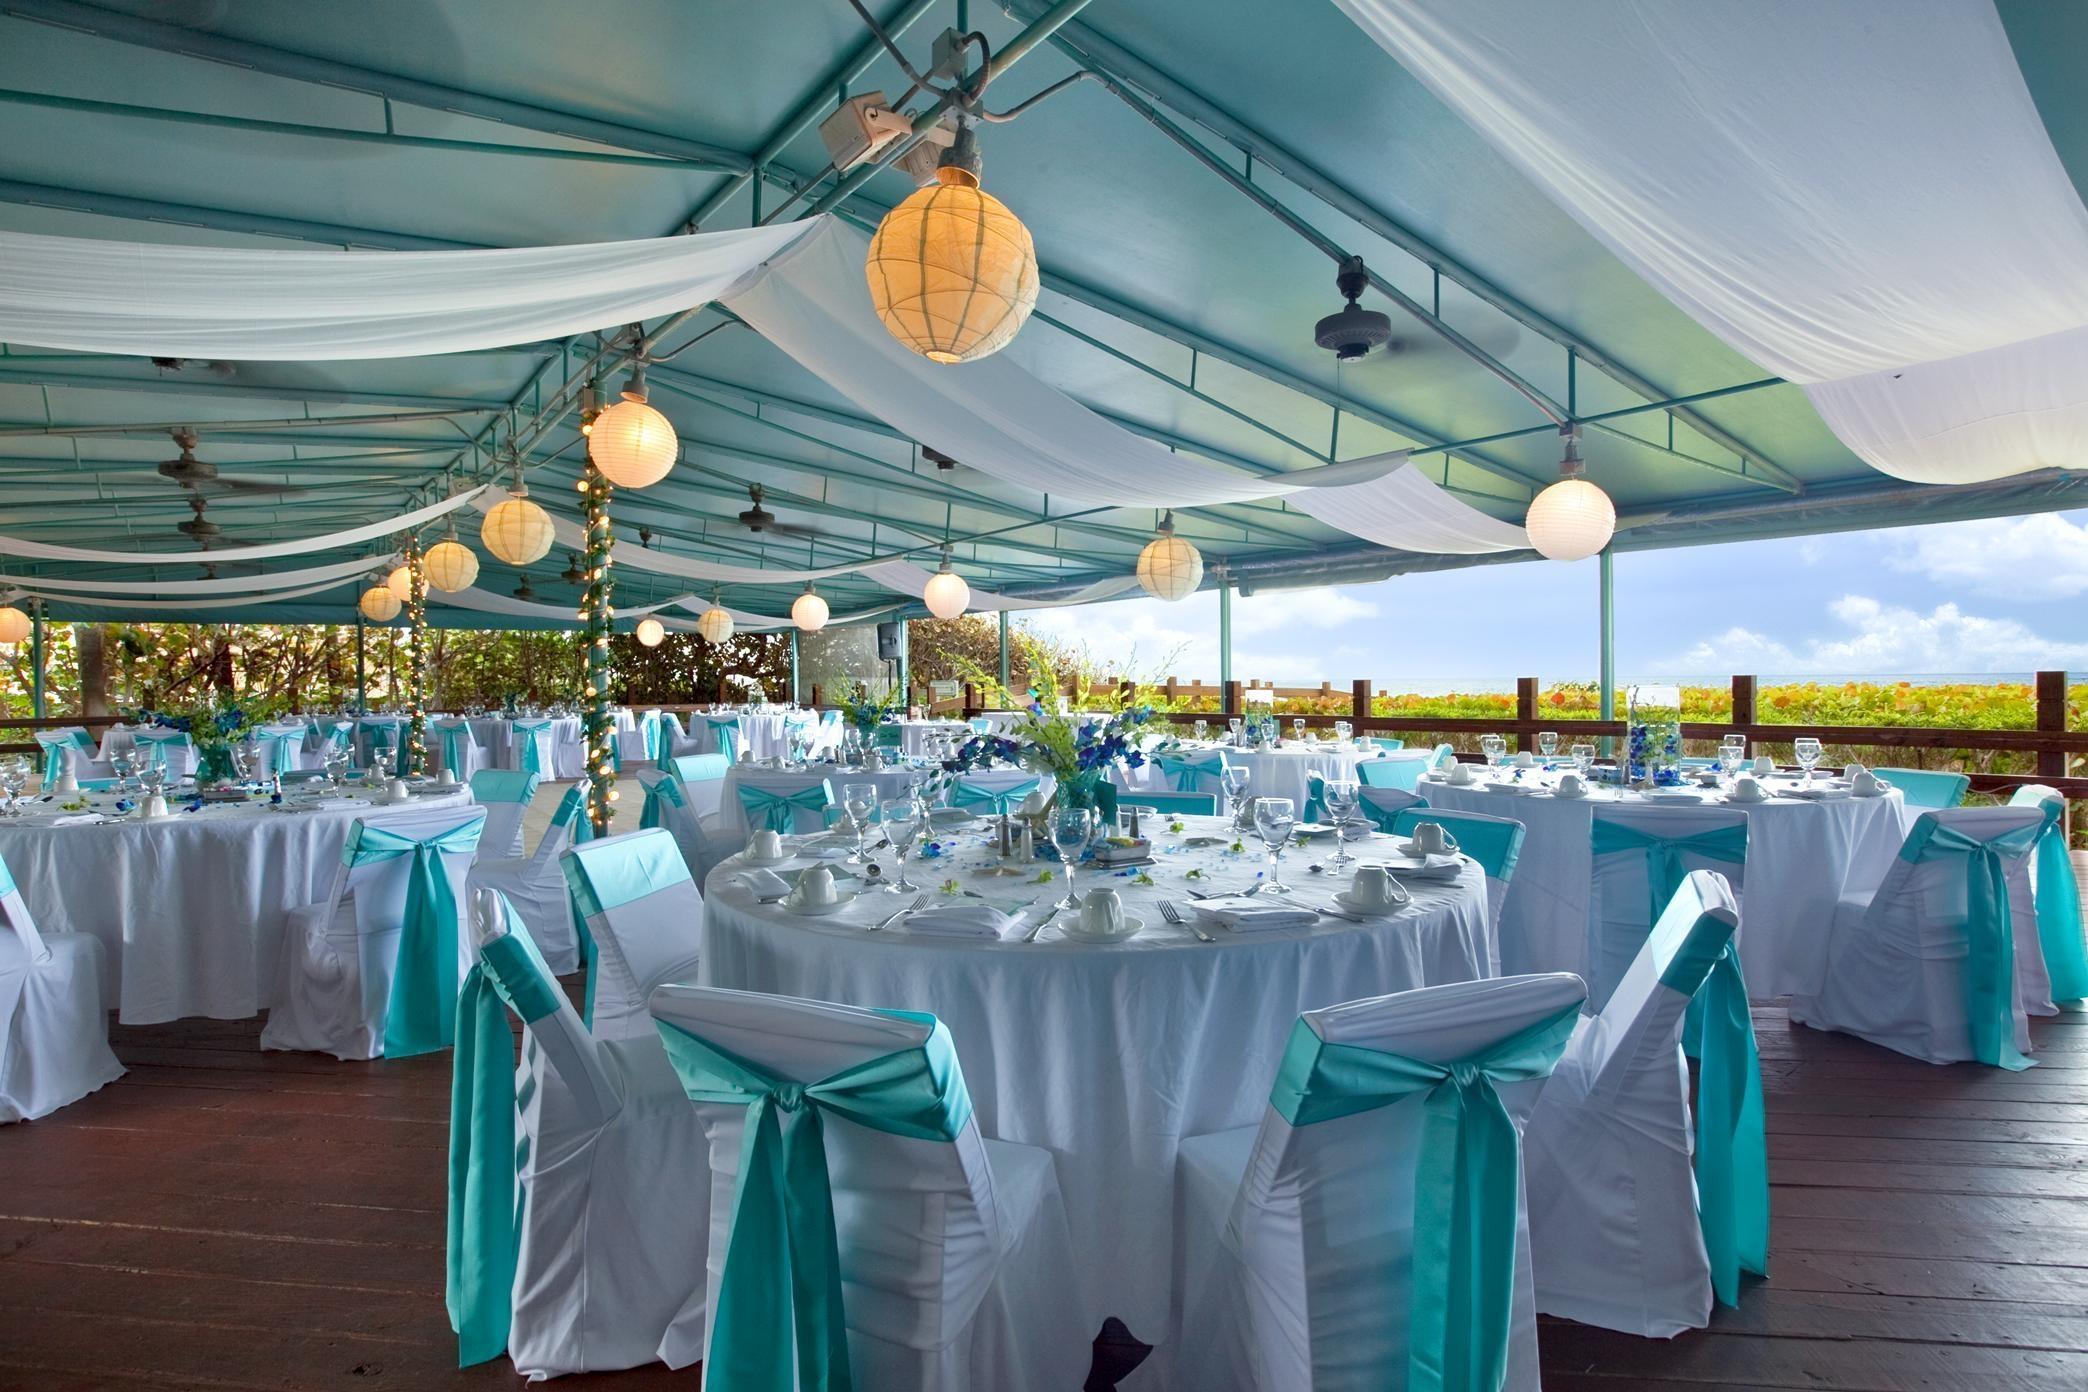 Hilton Singer Island Oceanfront/Palm Beaches Resort image 29